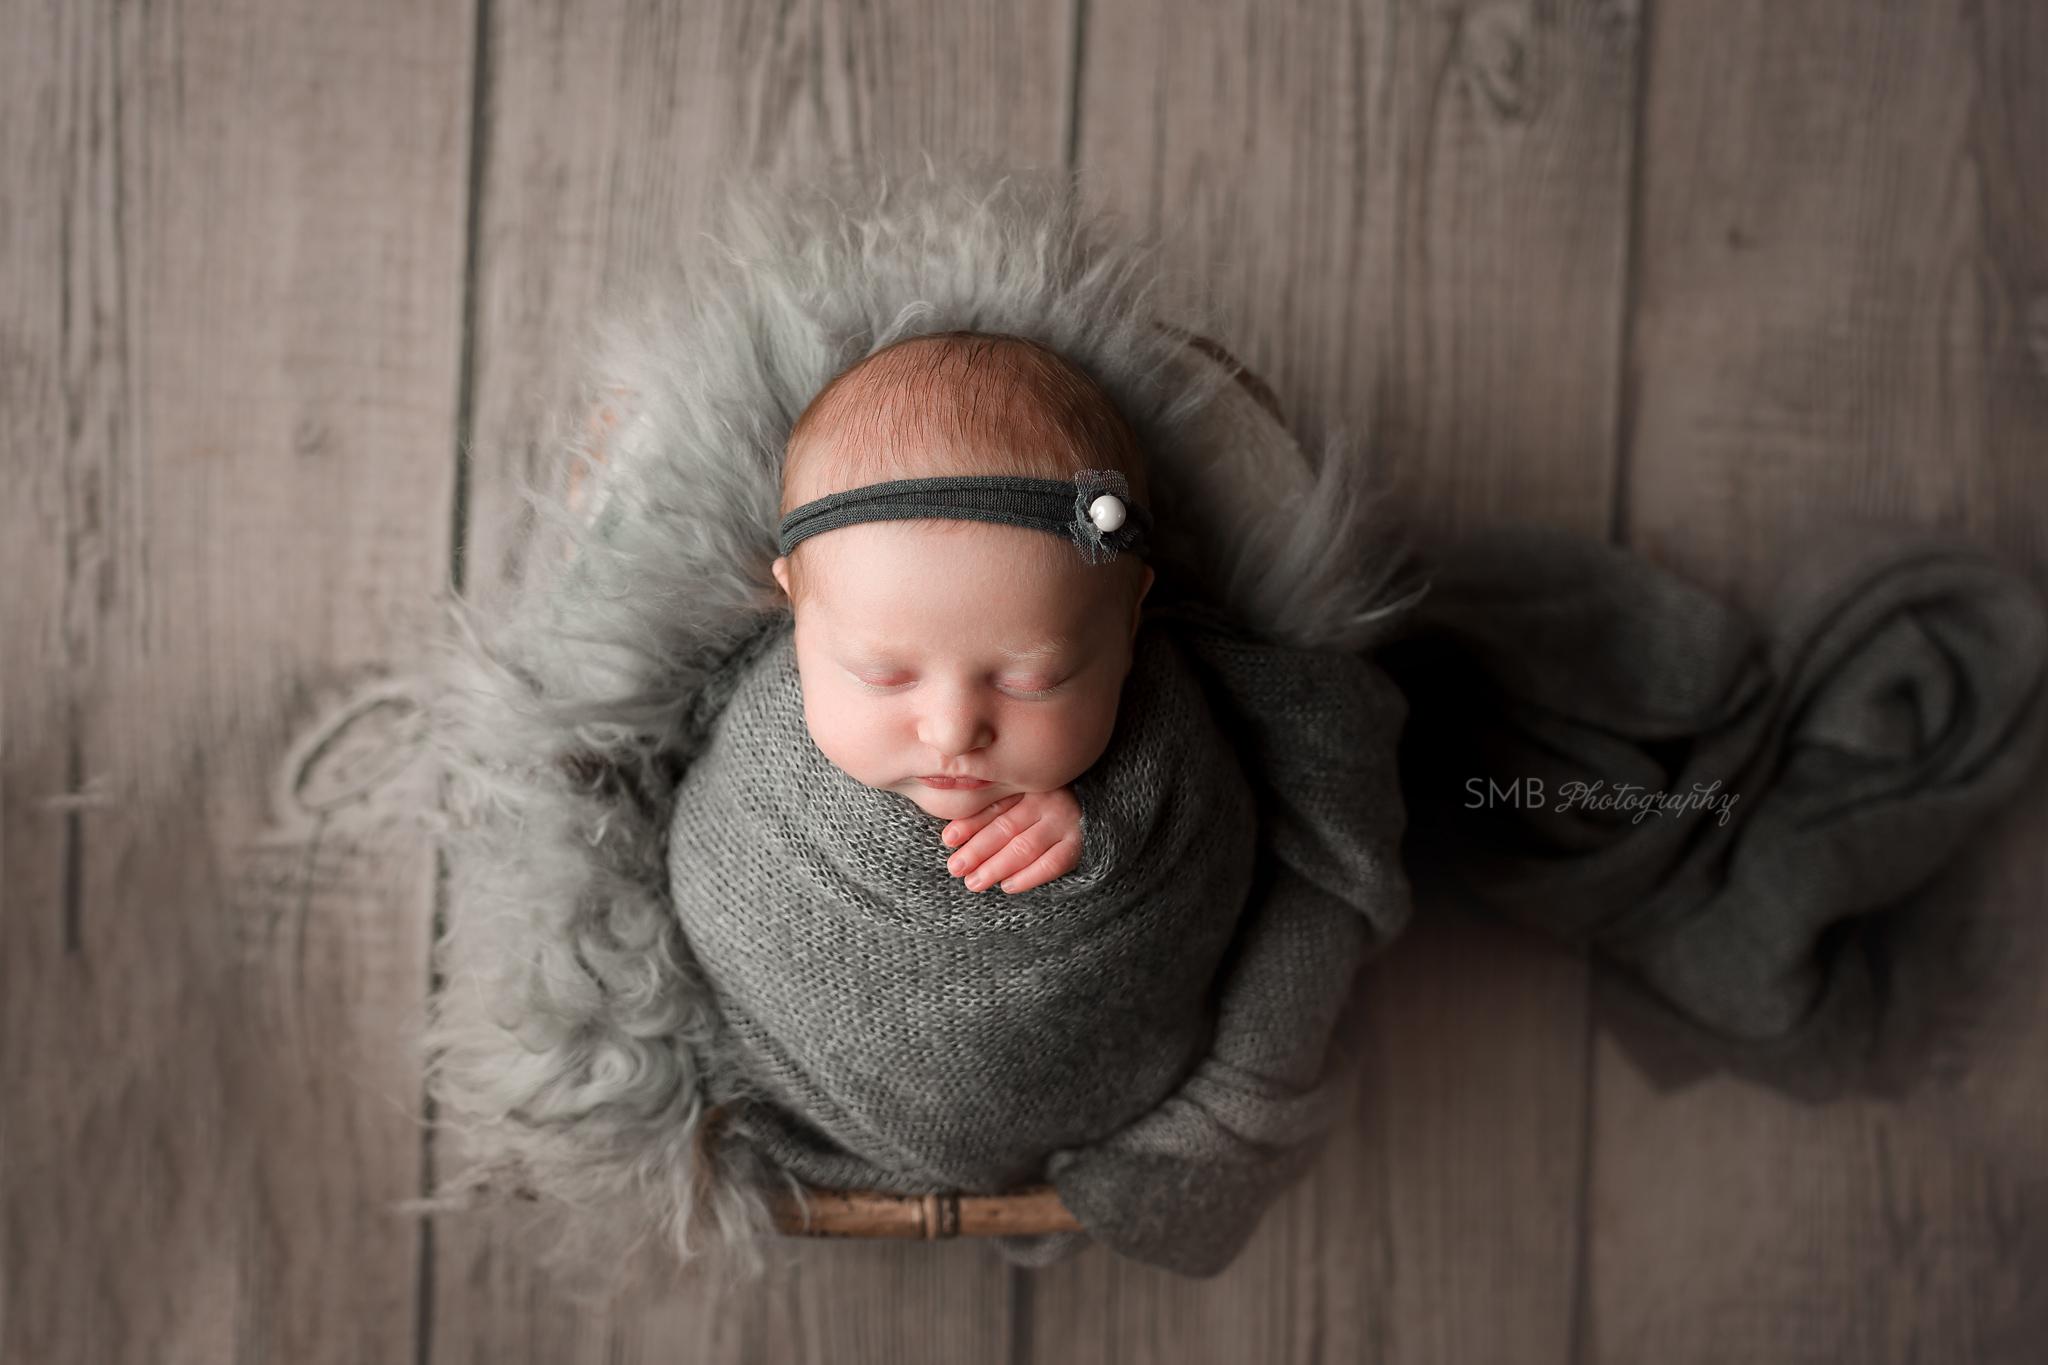 Newborn baby in basket with gray fur